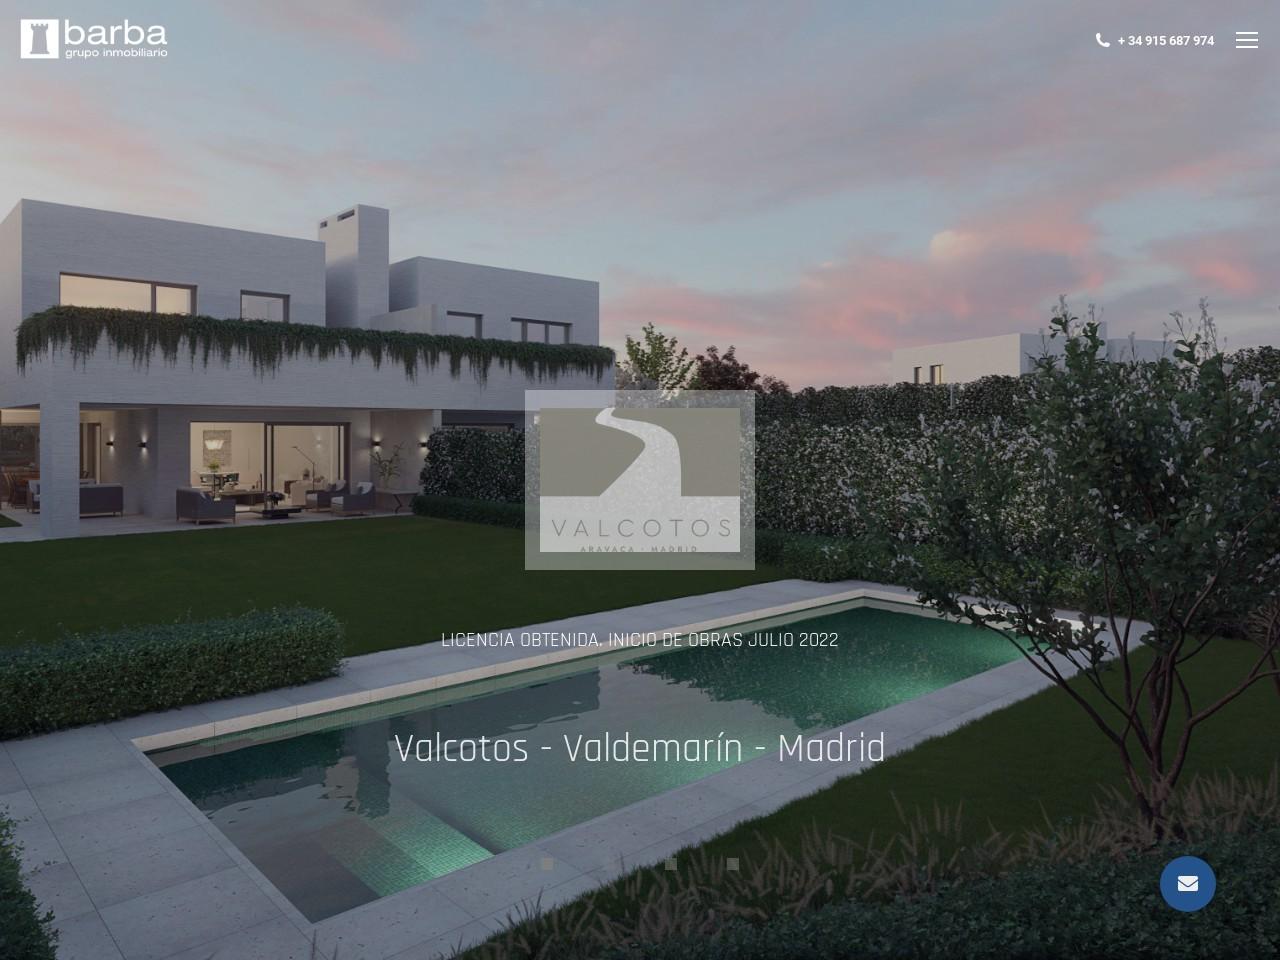 Captura de pantalla de www.barba.es